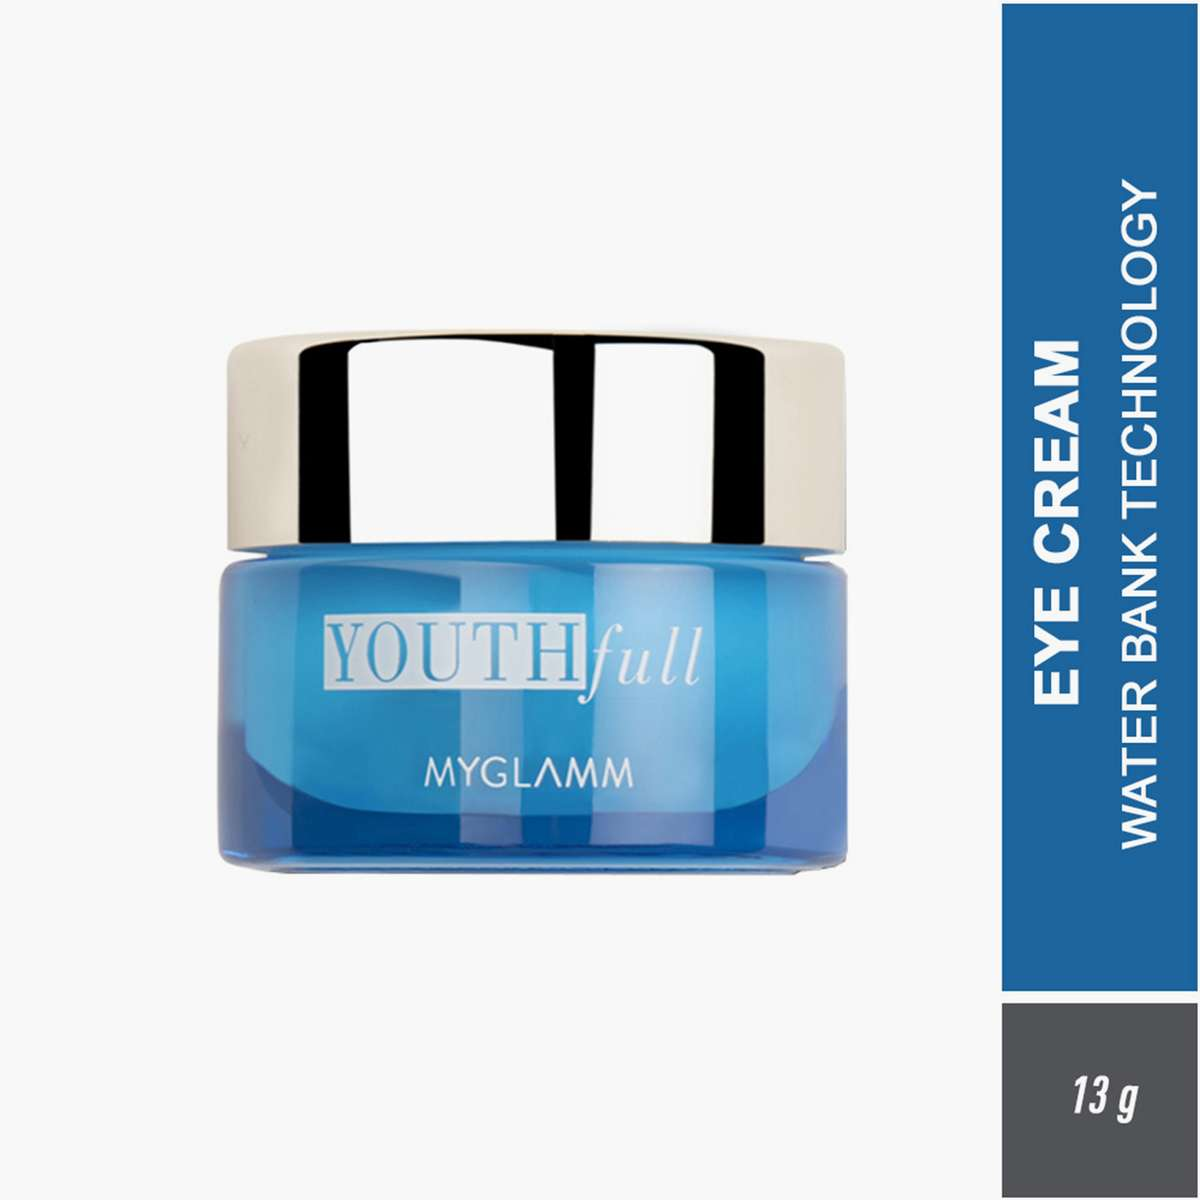 MYGLAMM Youthfull Hydrating Eye Cream With Water Bank Technology- 13g